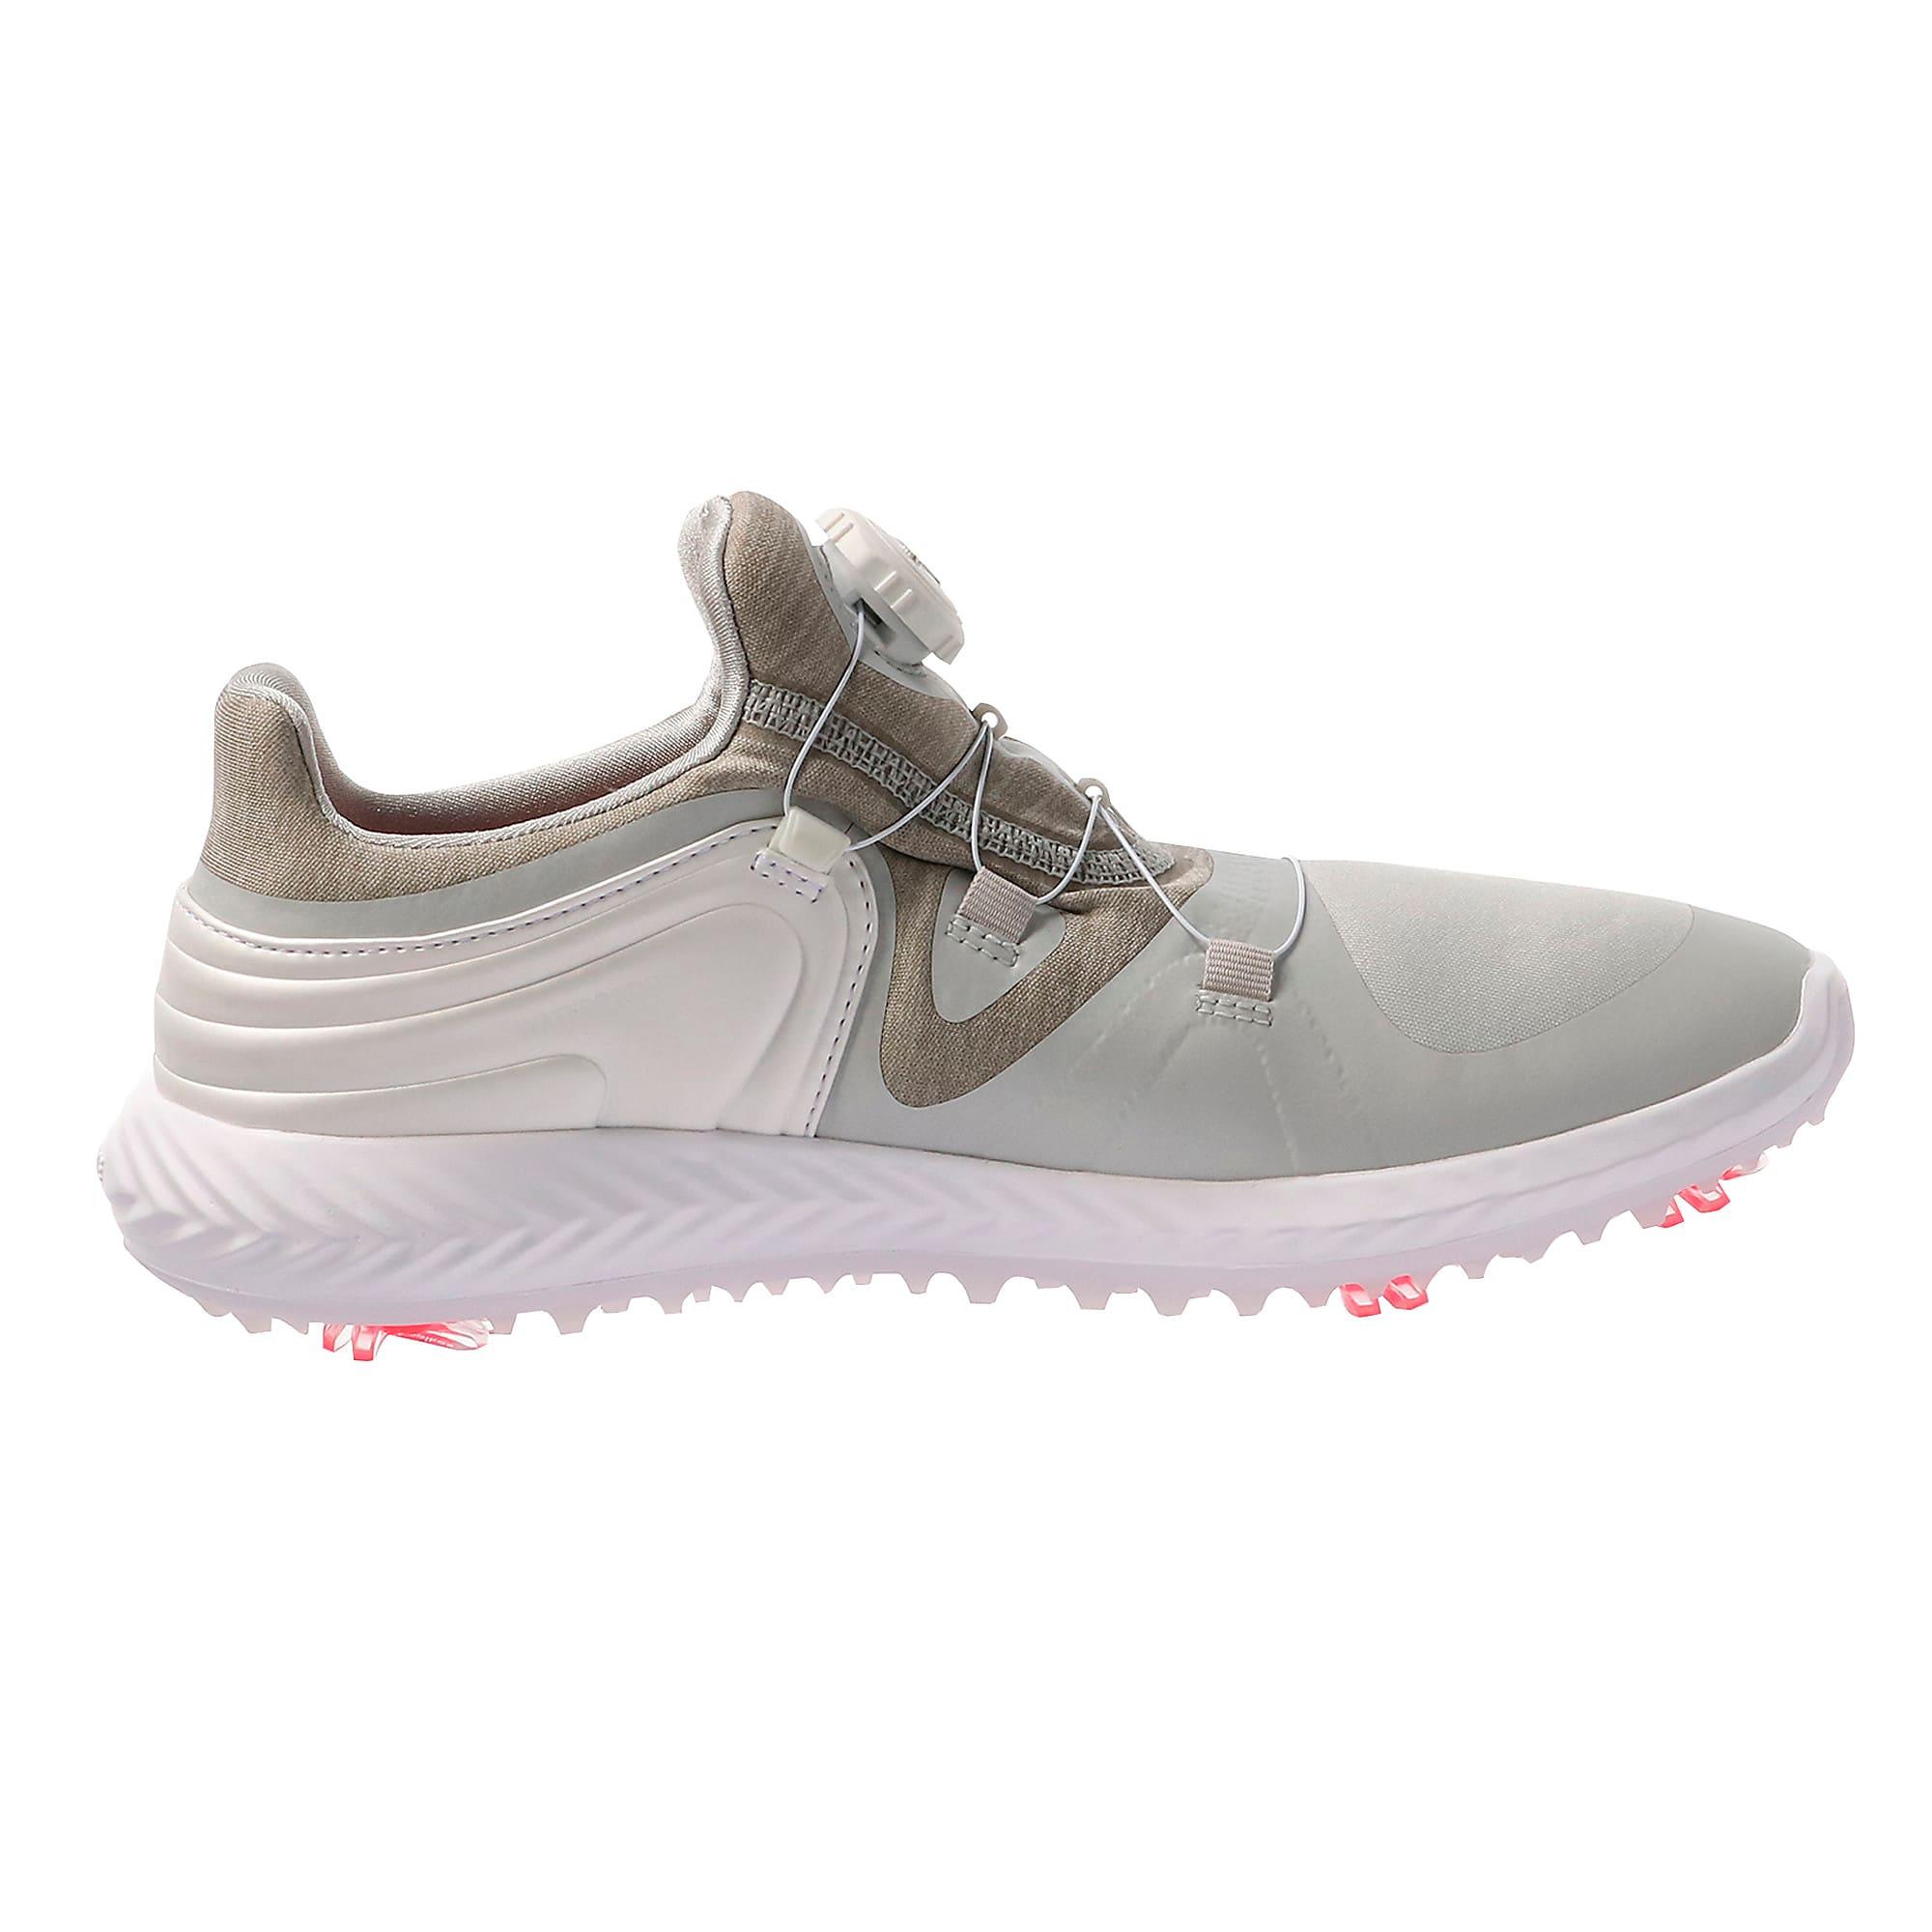 Thumbnail 3 of IGNITE Blaze Sport DISC Women's Golf Shoes, Gray Violet-White, medium